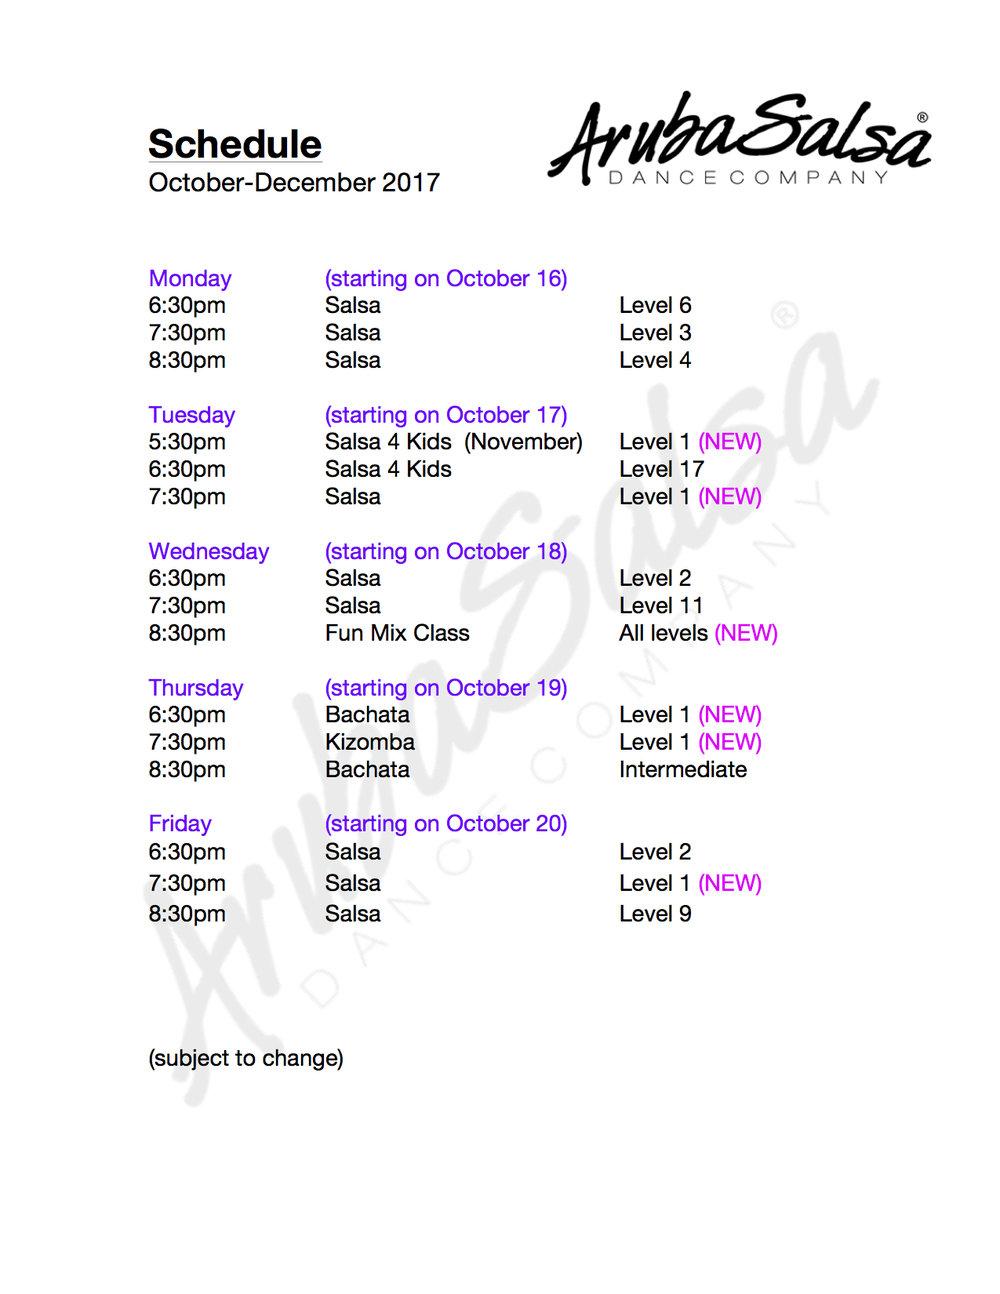 Schedule ArubaSalsa OCT-DEC 2017.jpg